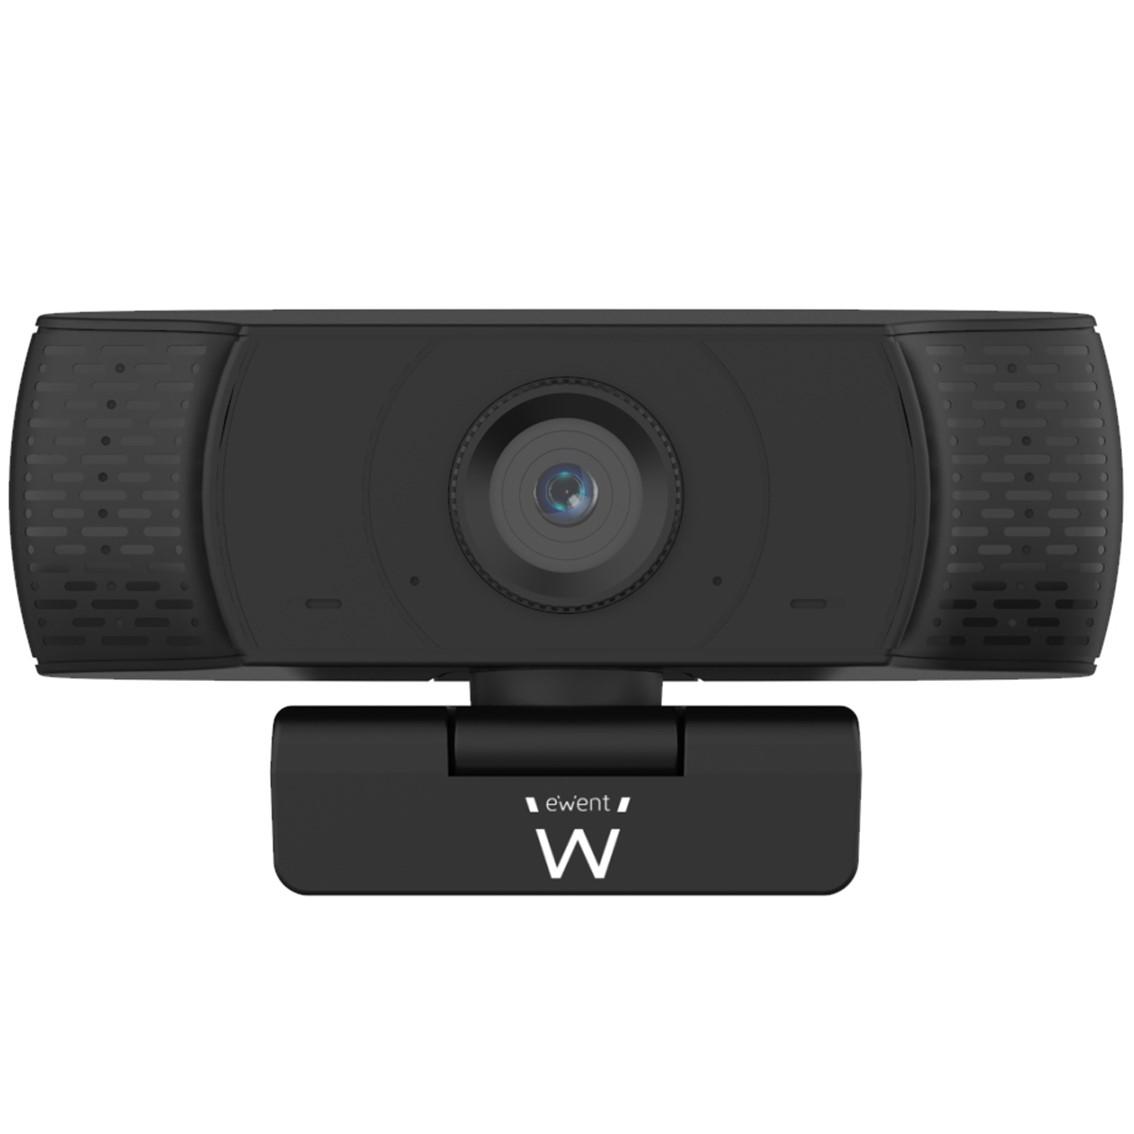 Camara web ewent ew1590 fhd -  30fps -  usb 2.0